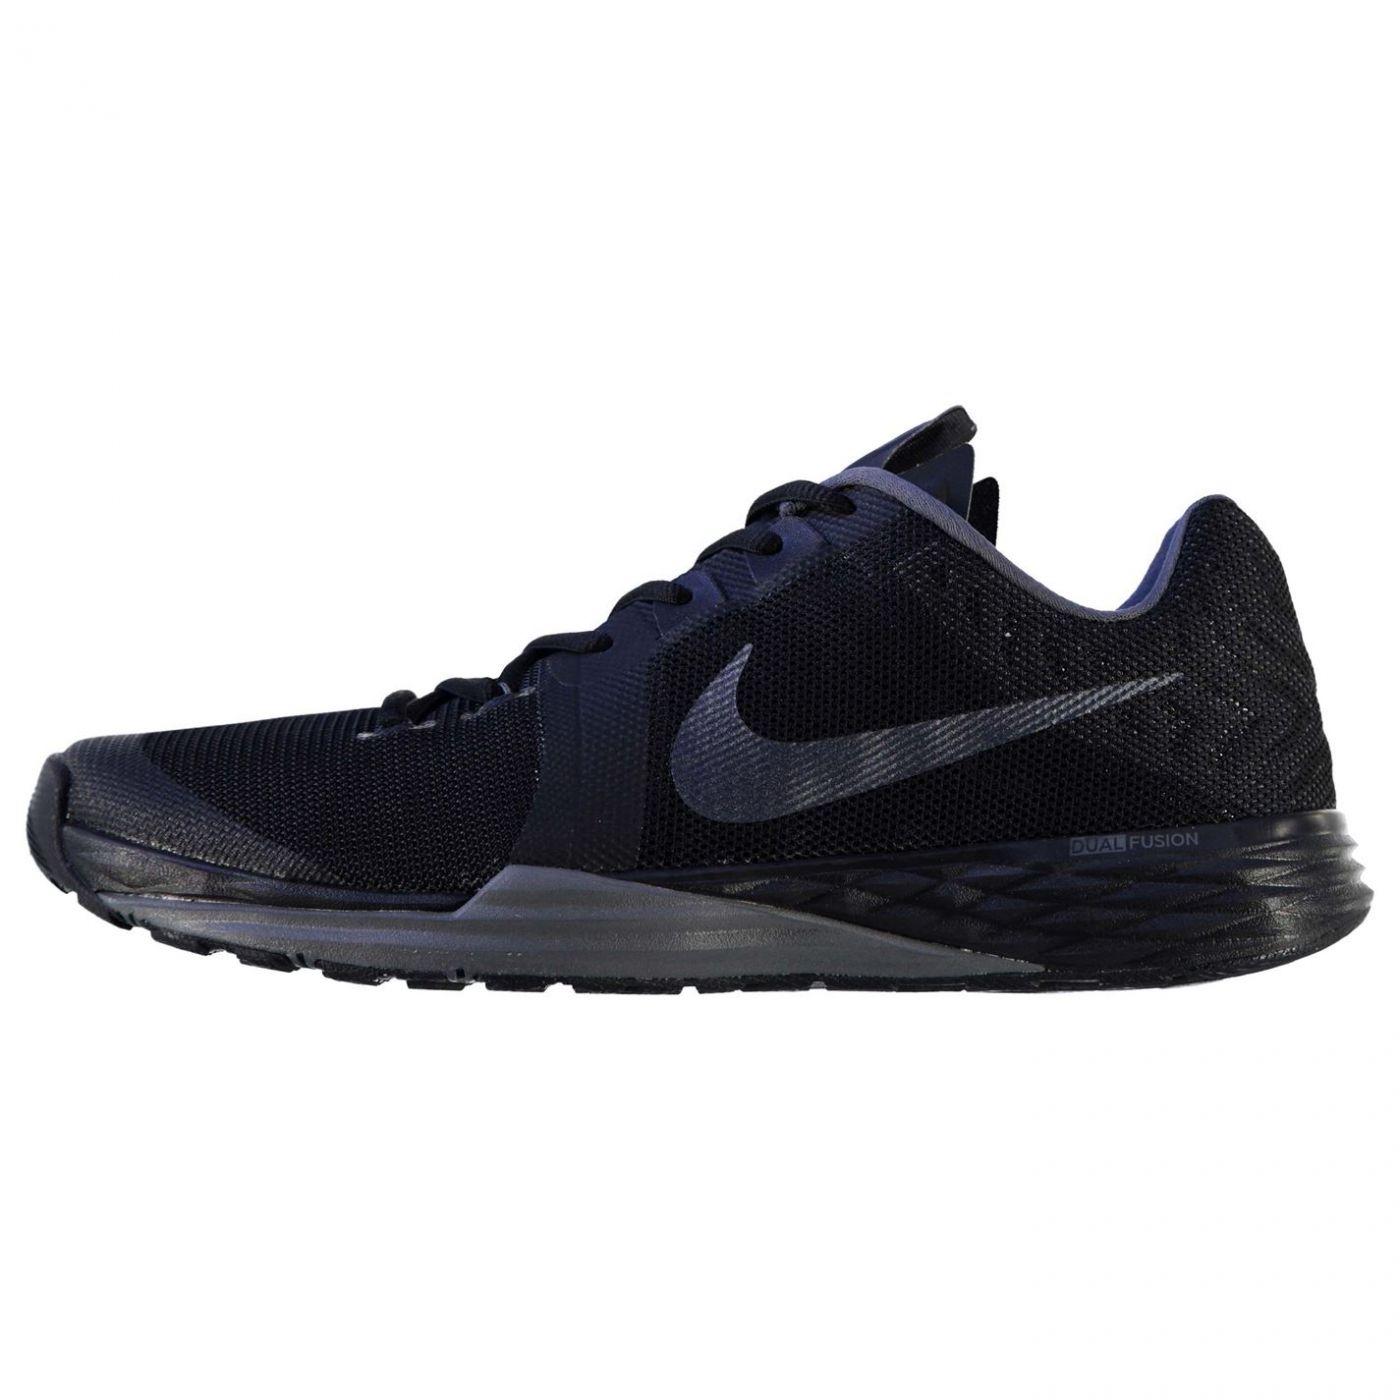 Nike Train Prime Iron DF Mens Training